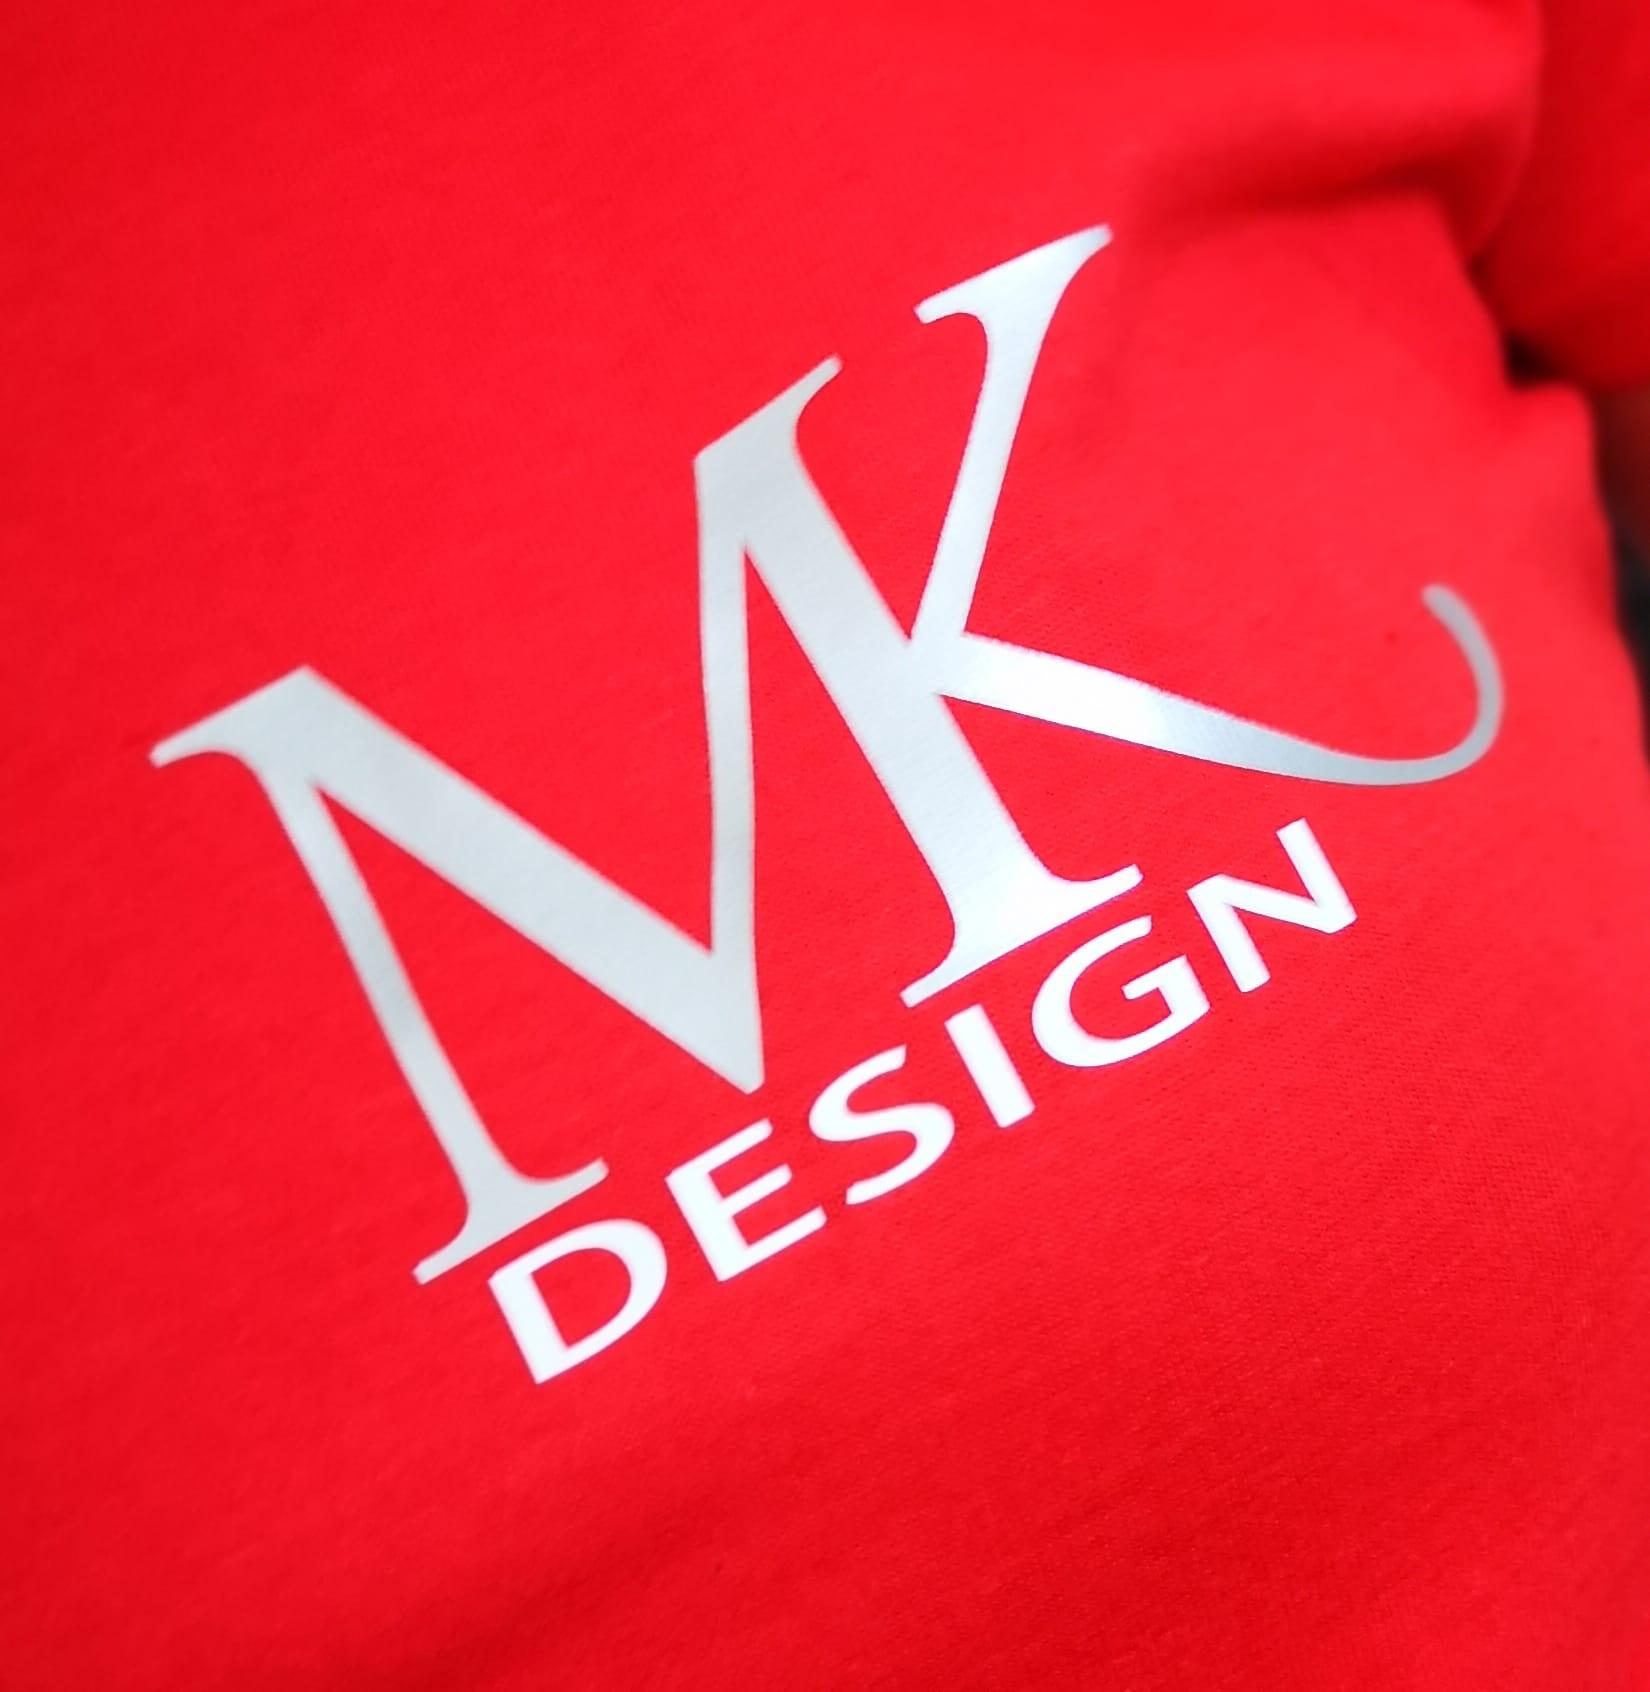 MK_design